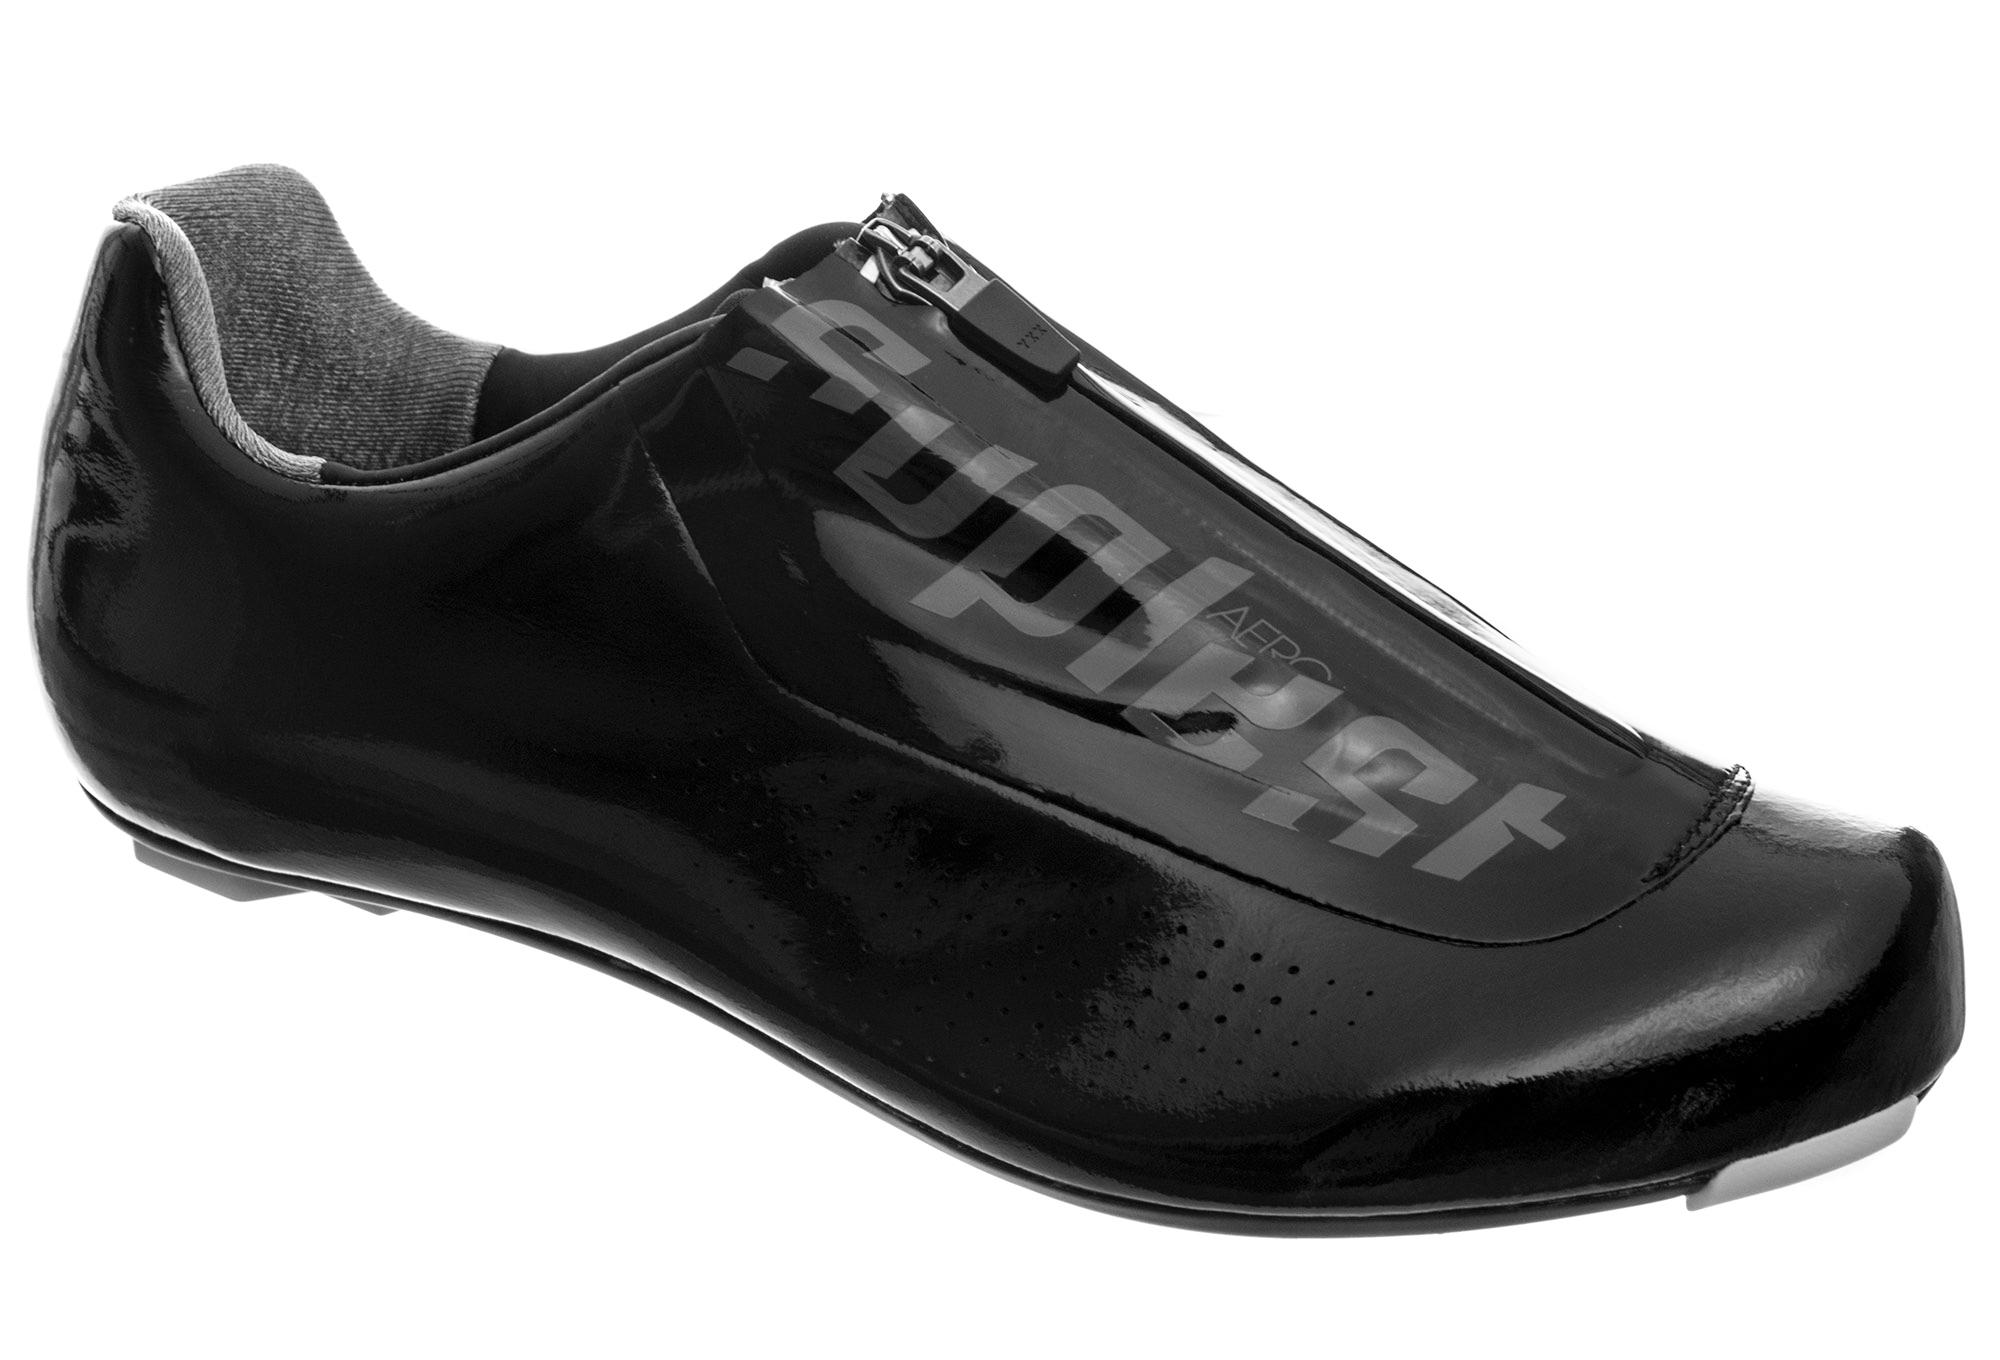 Suplest Pro Aero Road Shoes Black